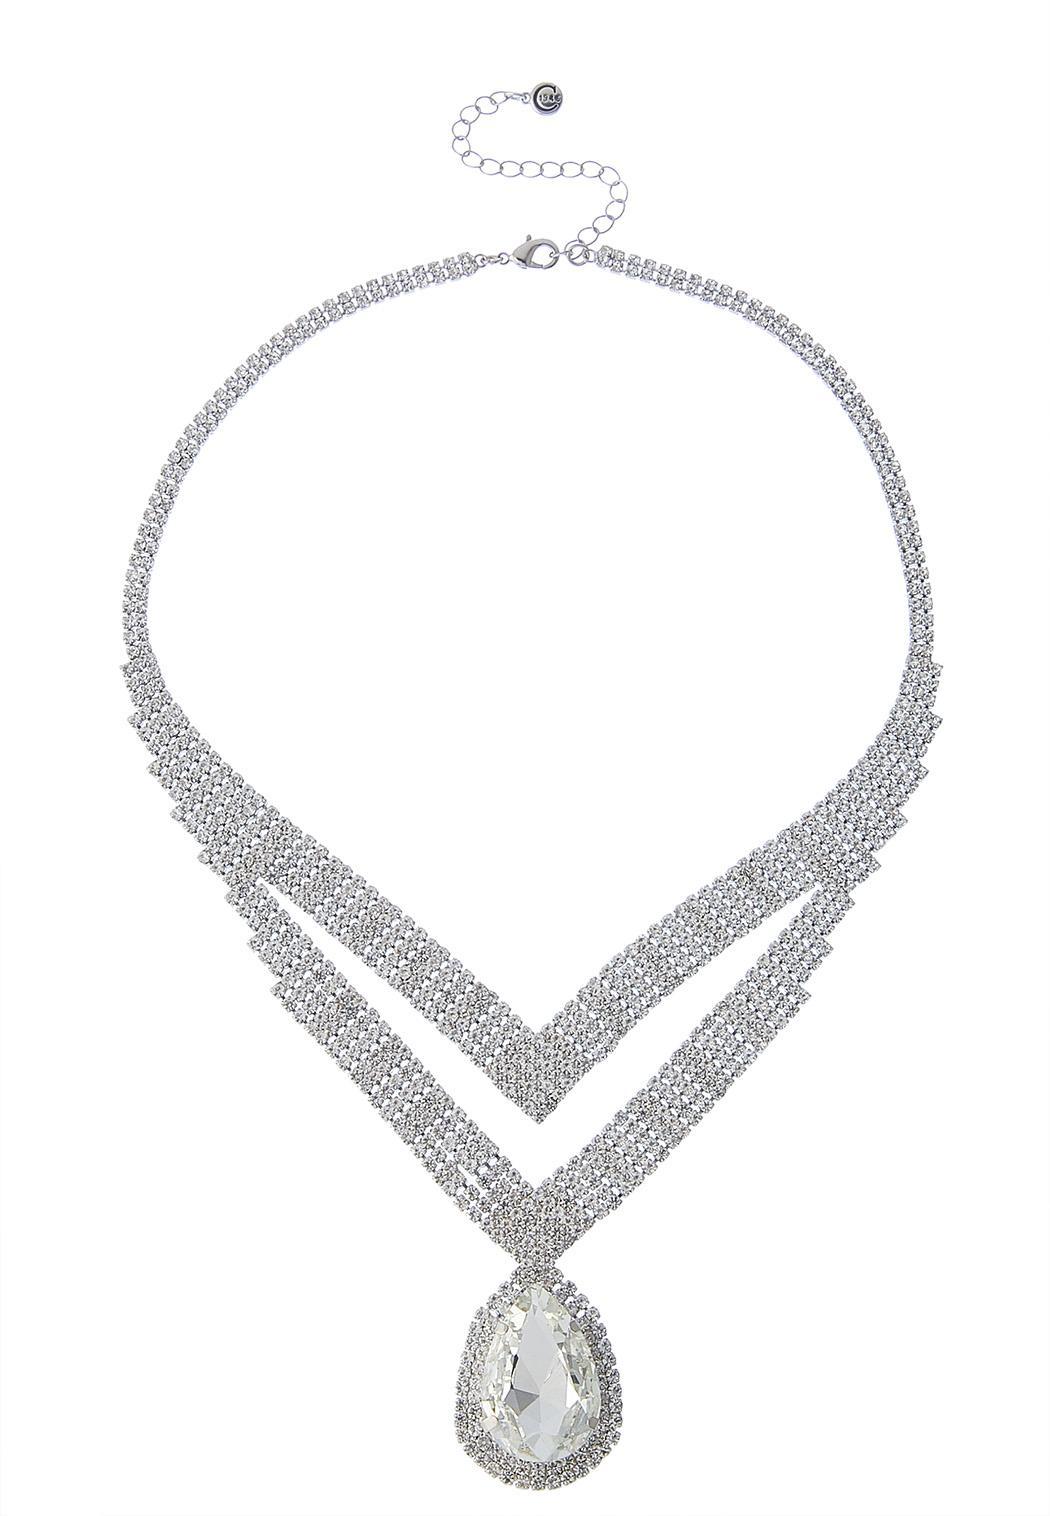 Chevron Stone Statement Necklace